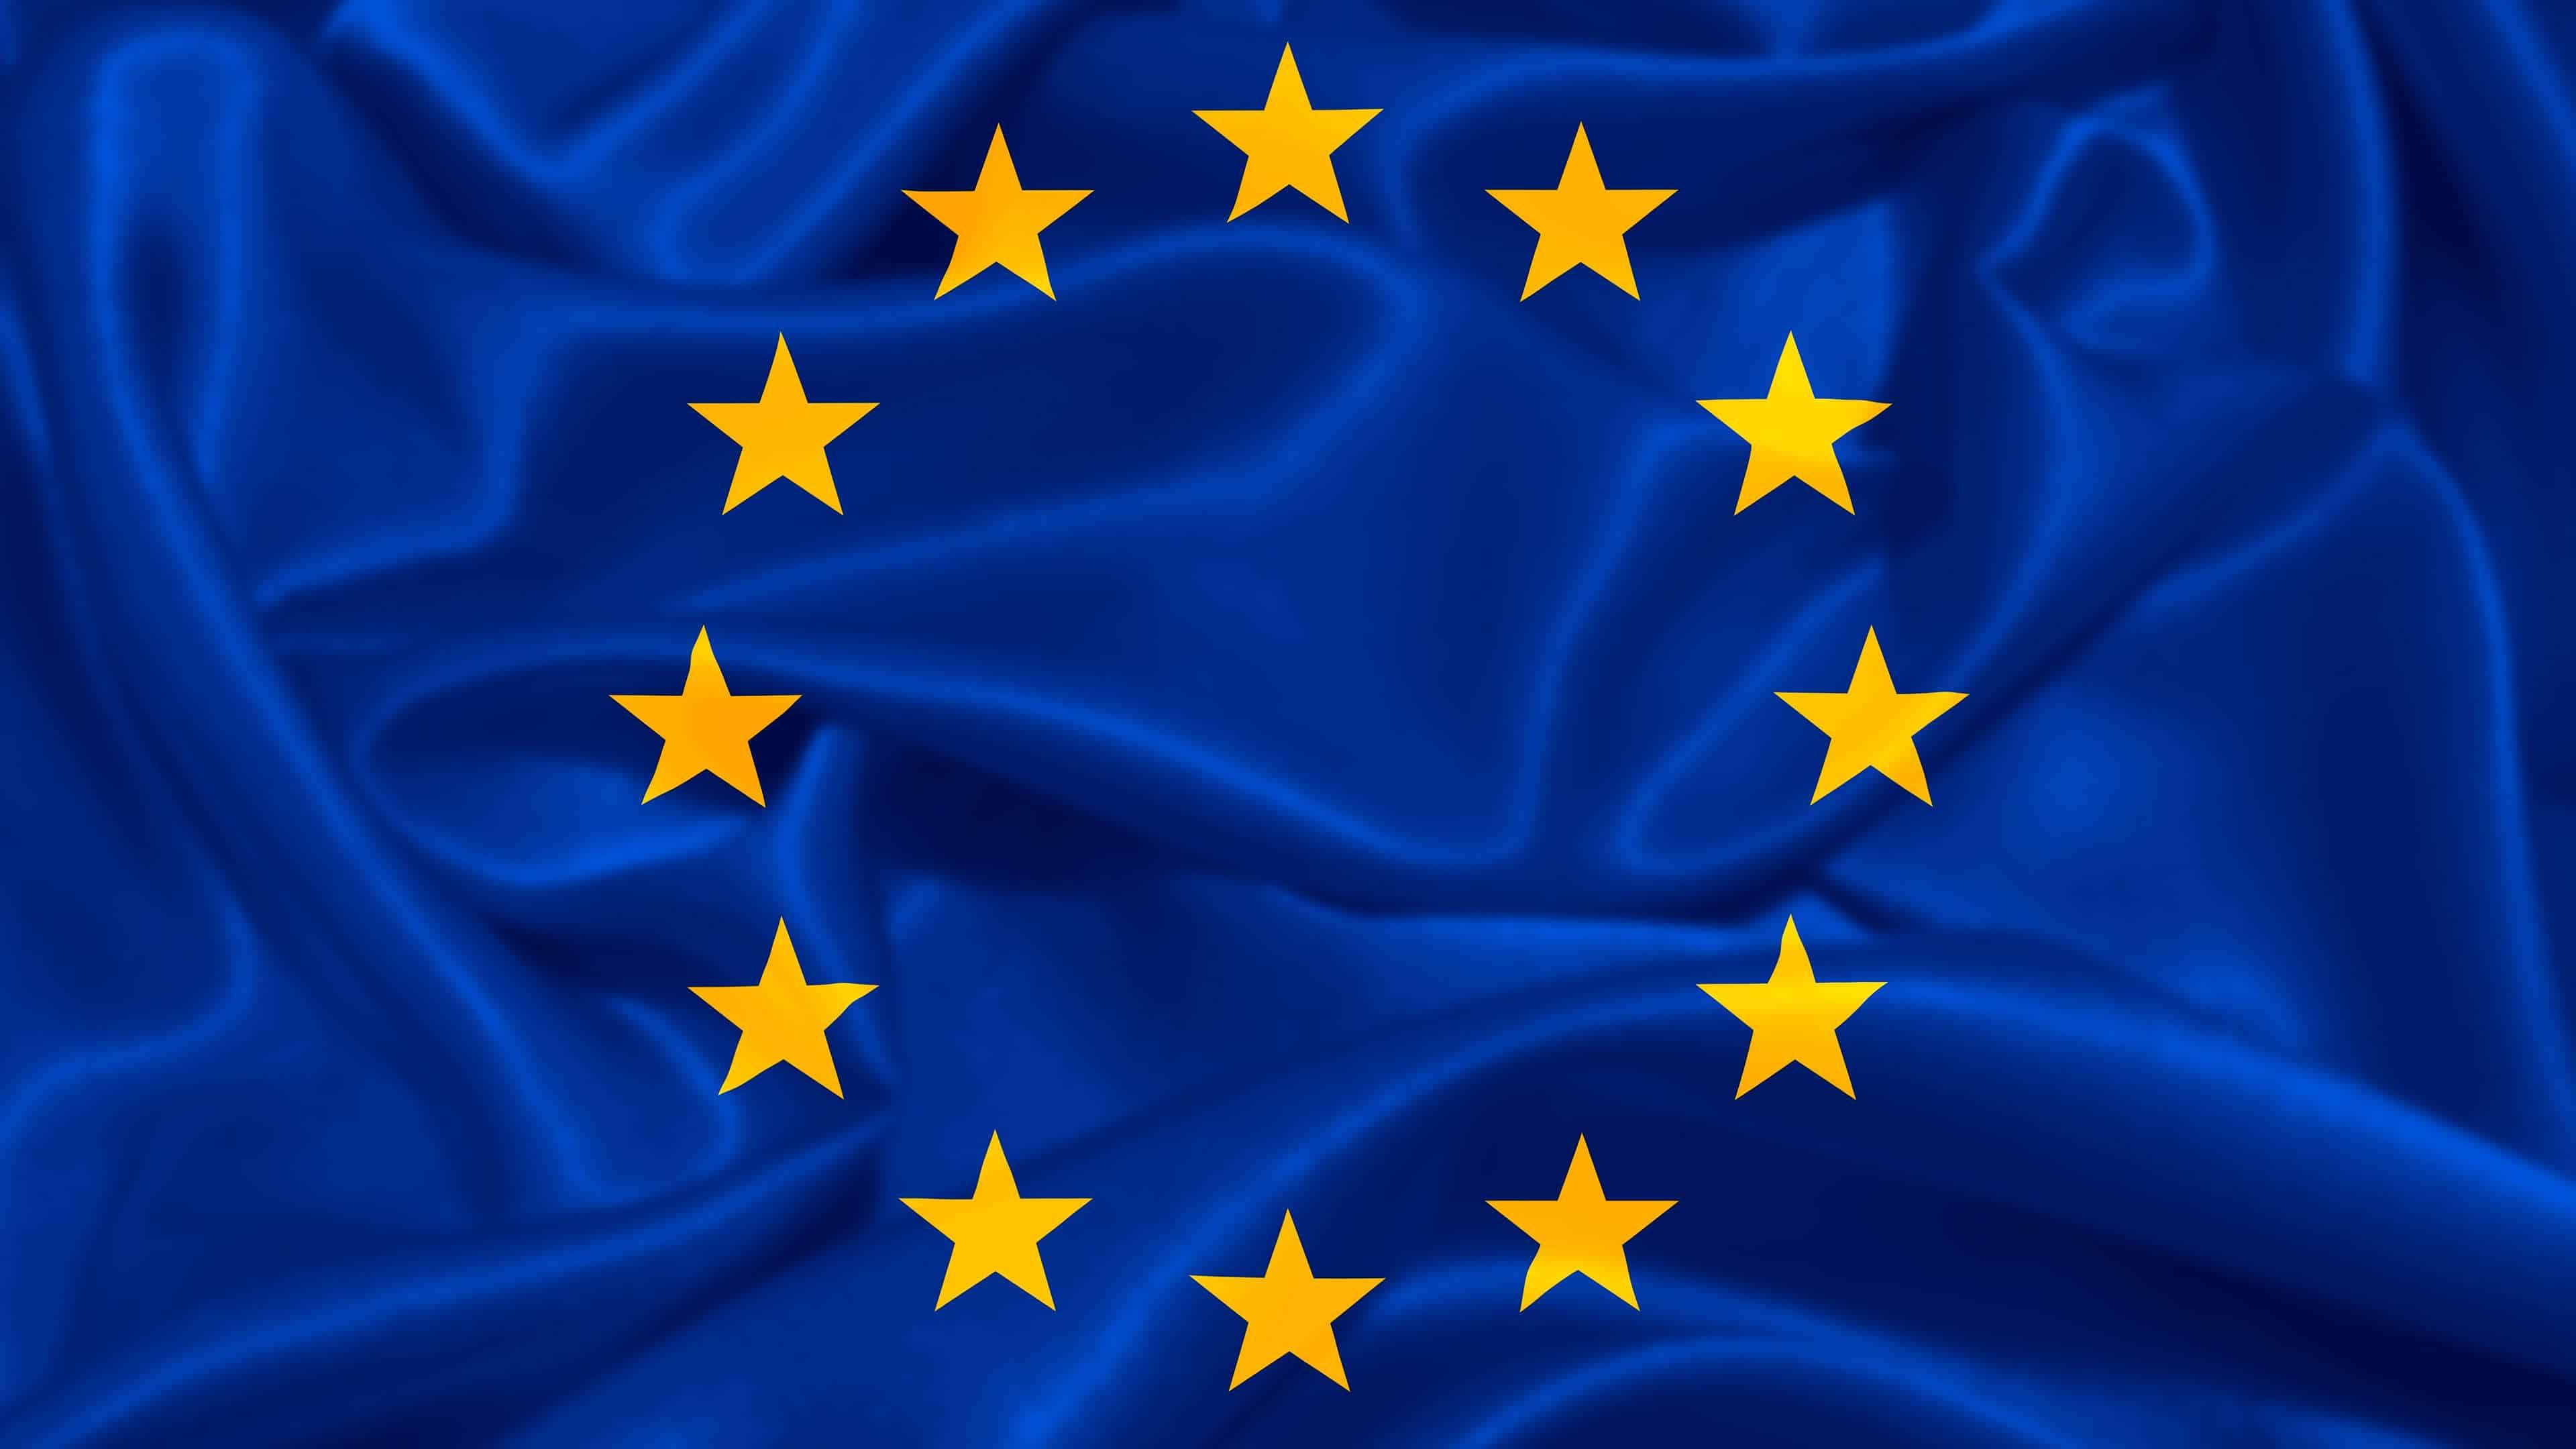 European Union EU Flag UHD 4K Wallpaper Pixelz 3840x2160